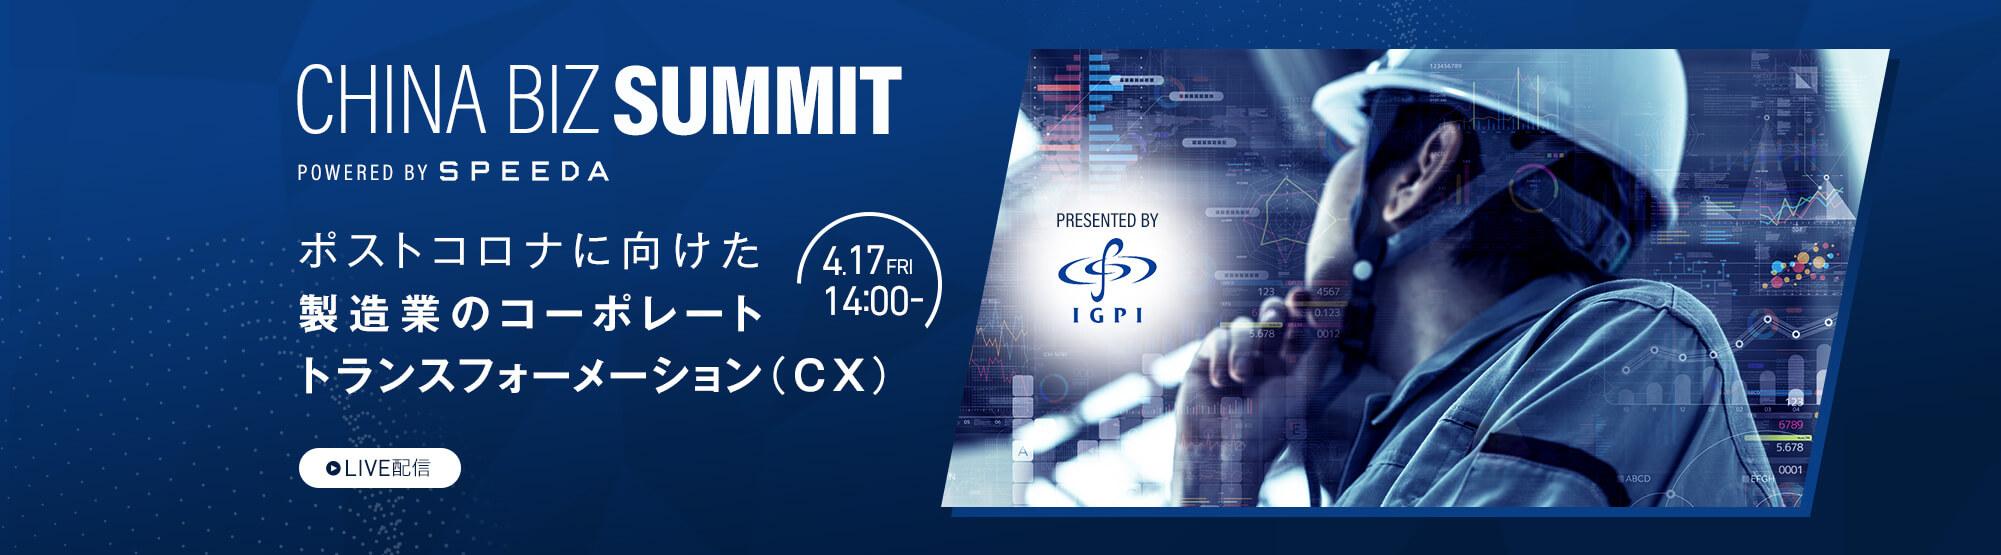 China Biz Summit『ポストコロナに向けた製造業のコーポレートトランスフォーメーション(CX)』powered by SPEEDA